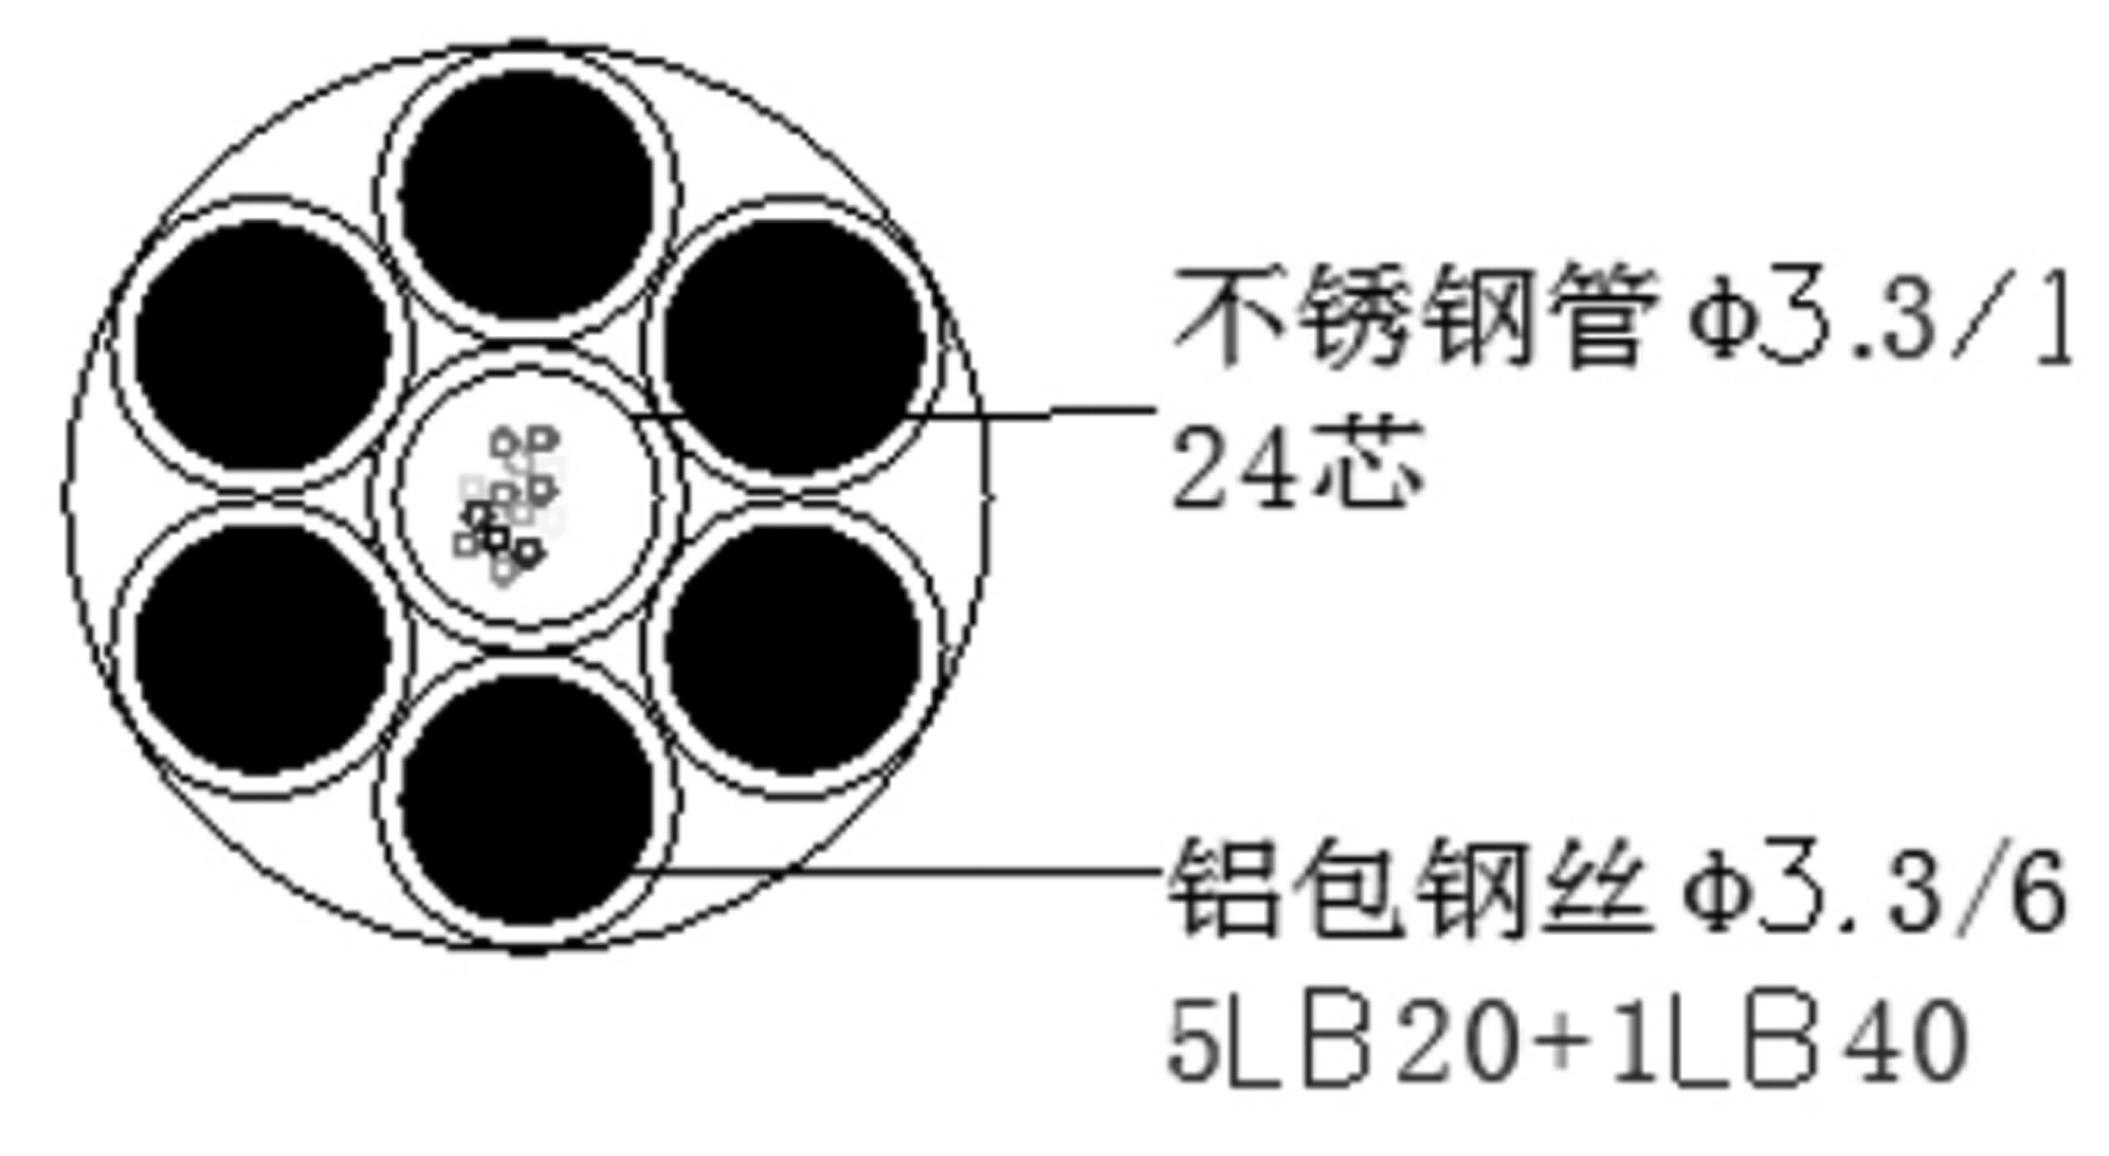 复空架图1.png